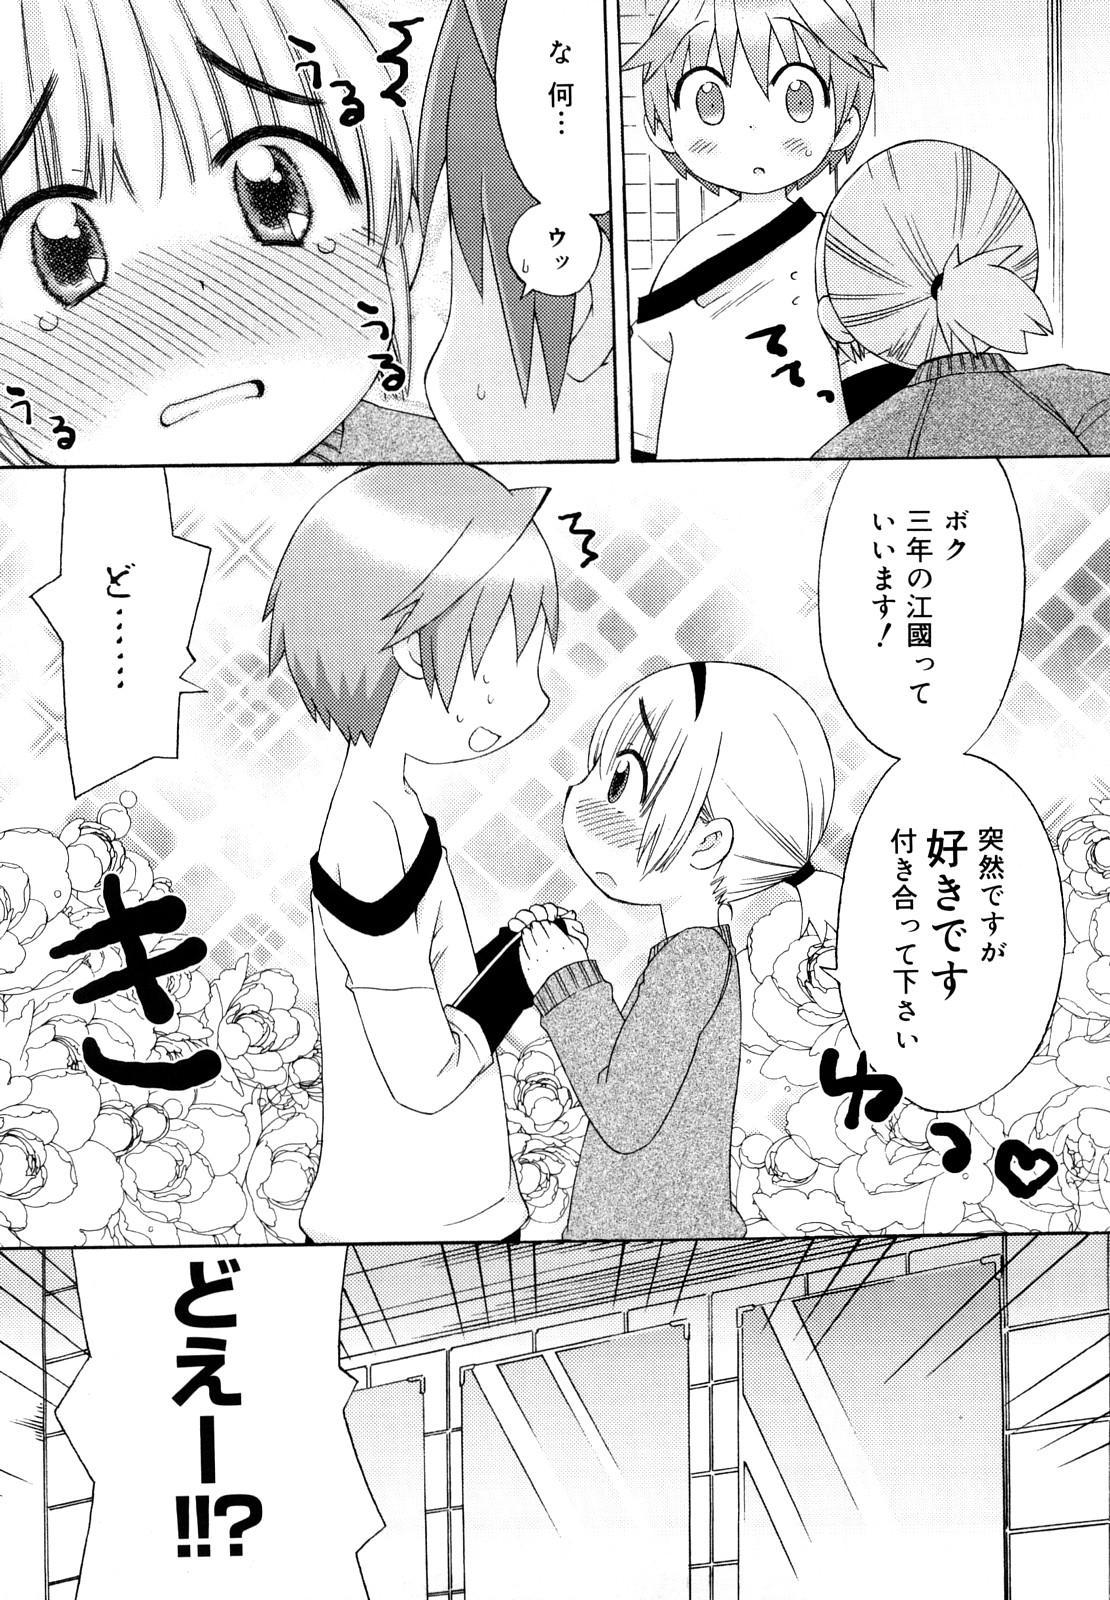 Hatsuden Pandakun! Shinsouban 151